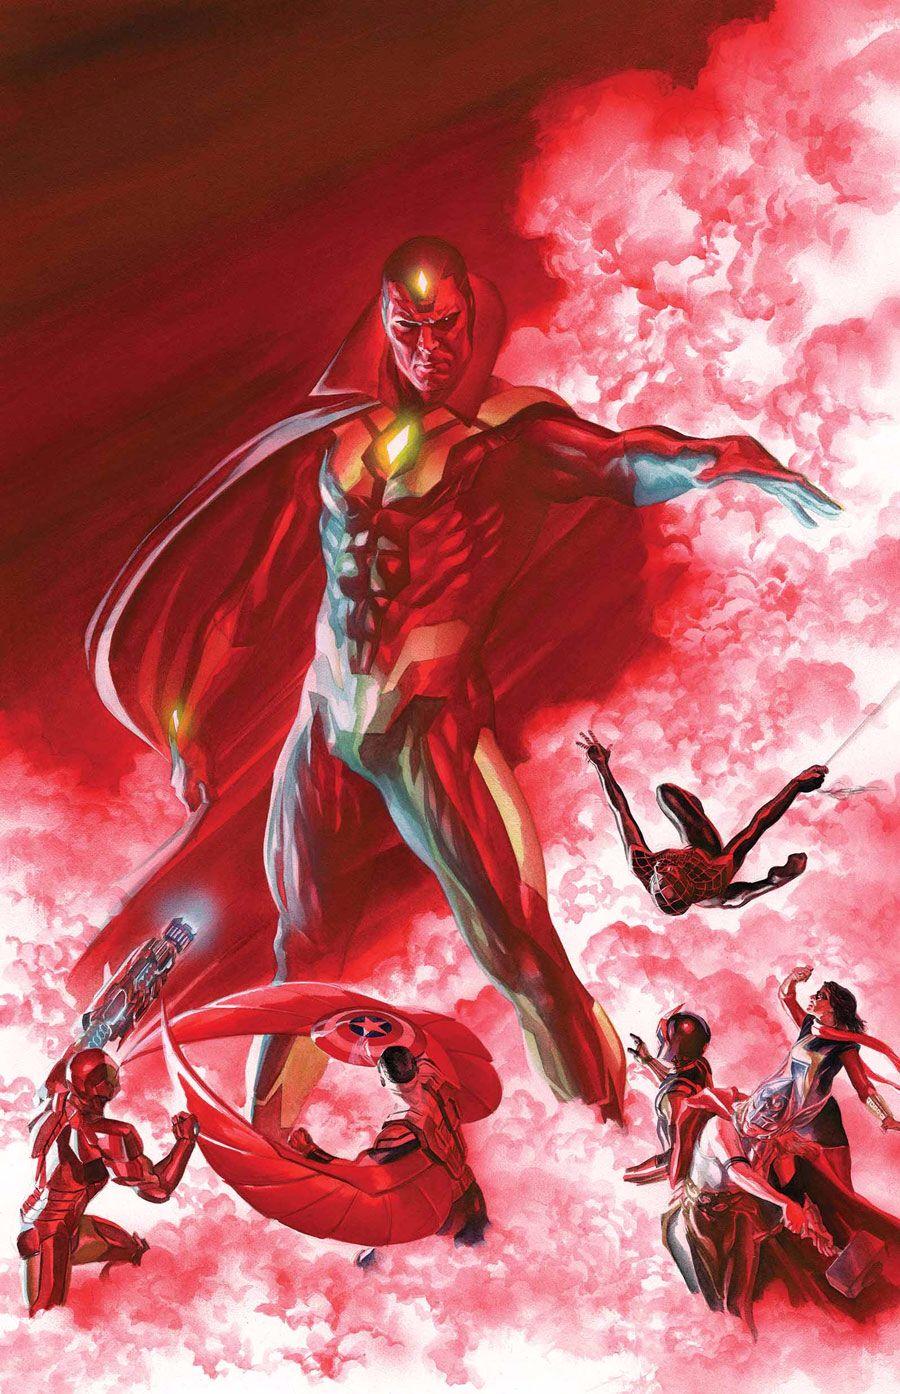 Vision | Marvel, Alex ross, Marvel comics art